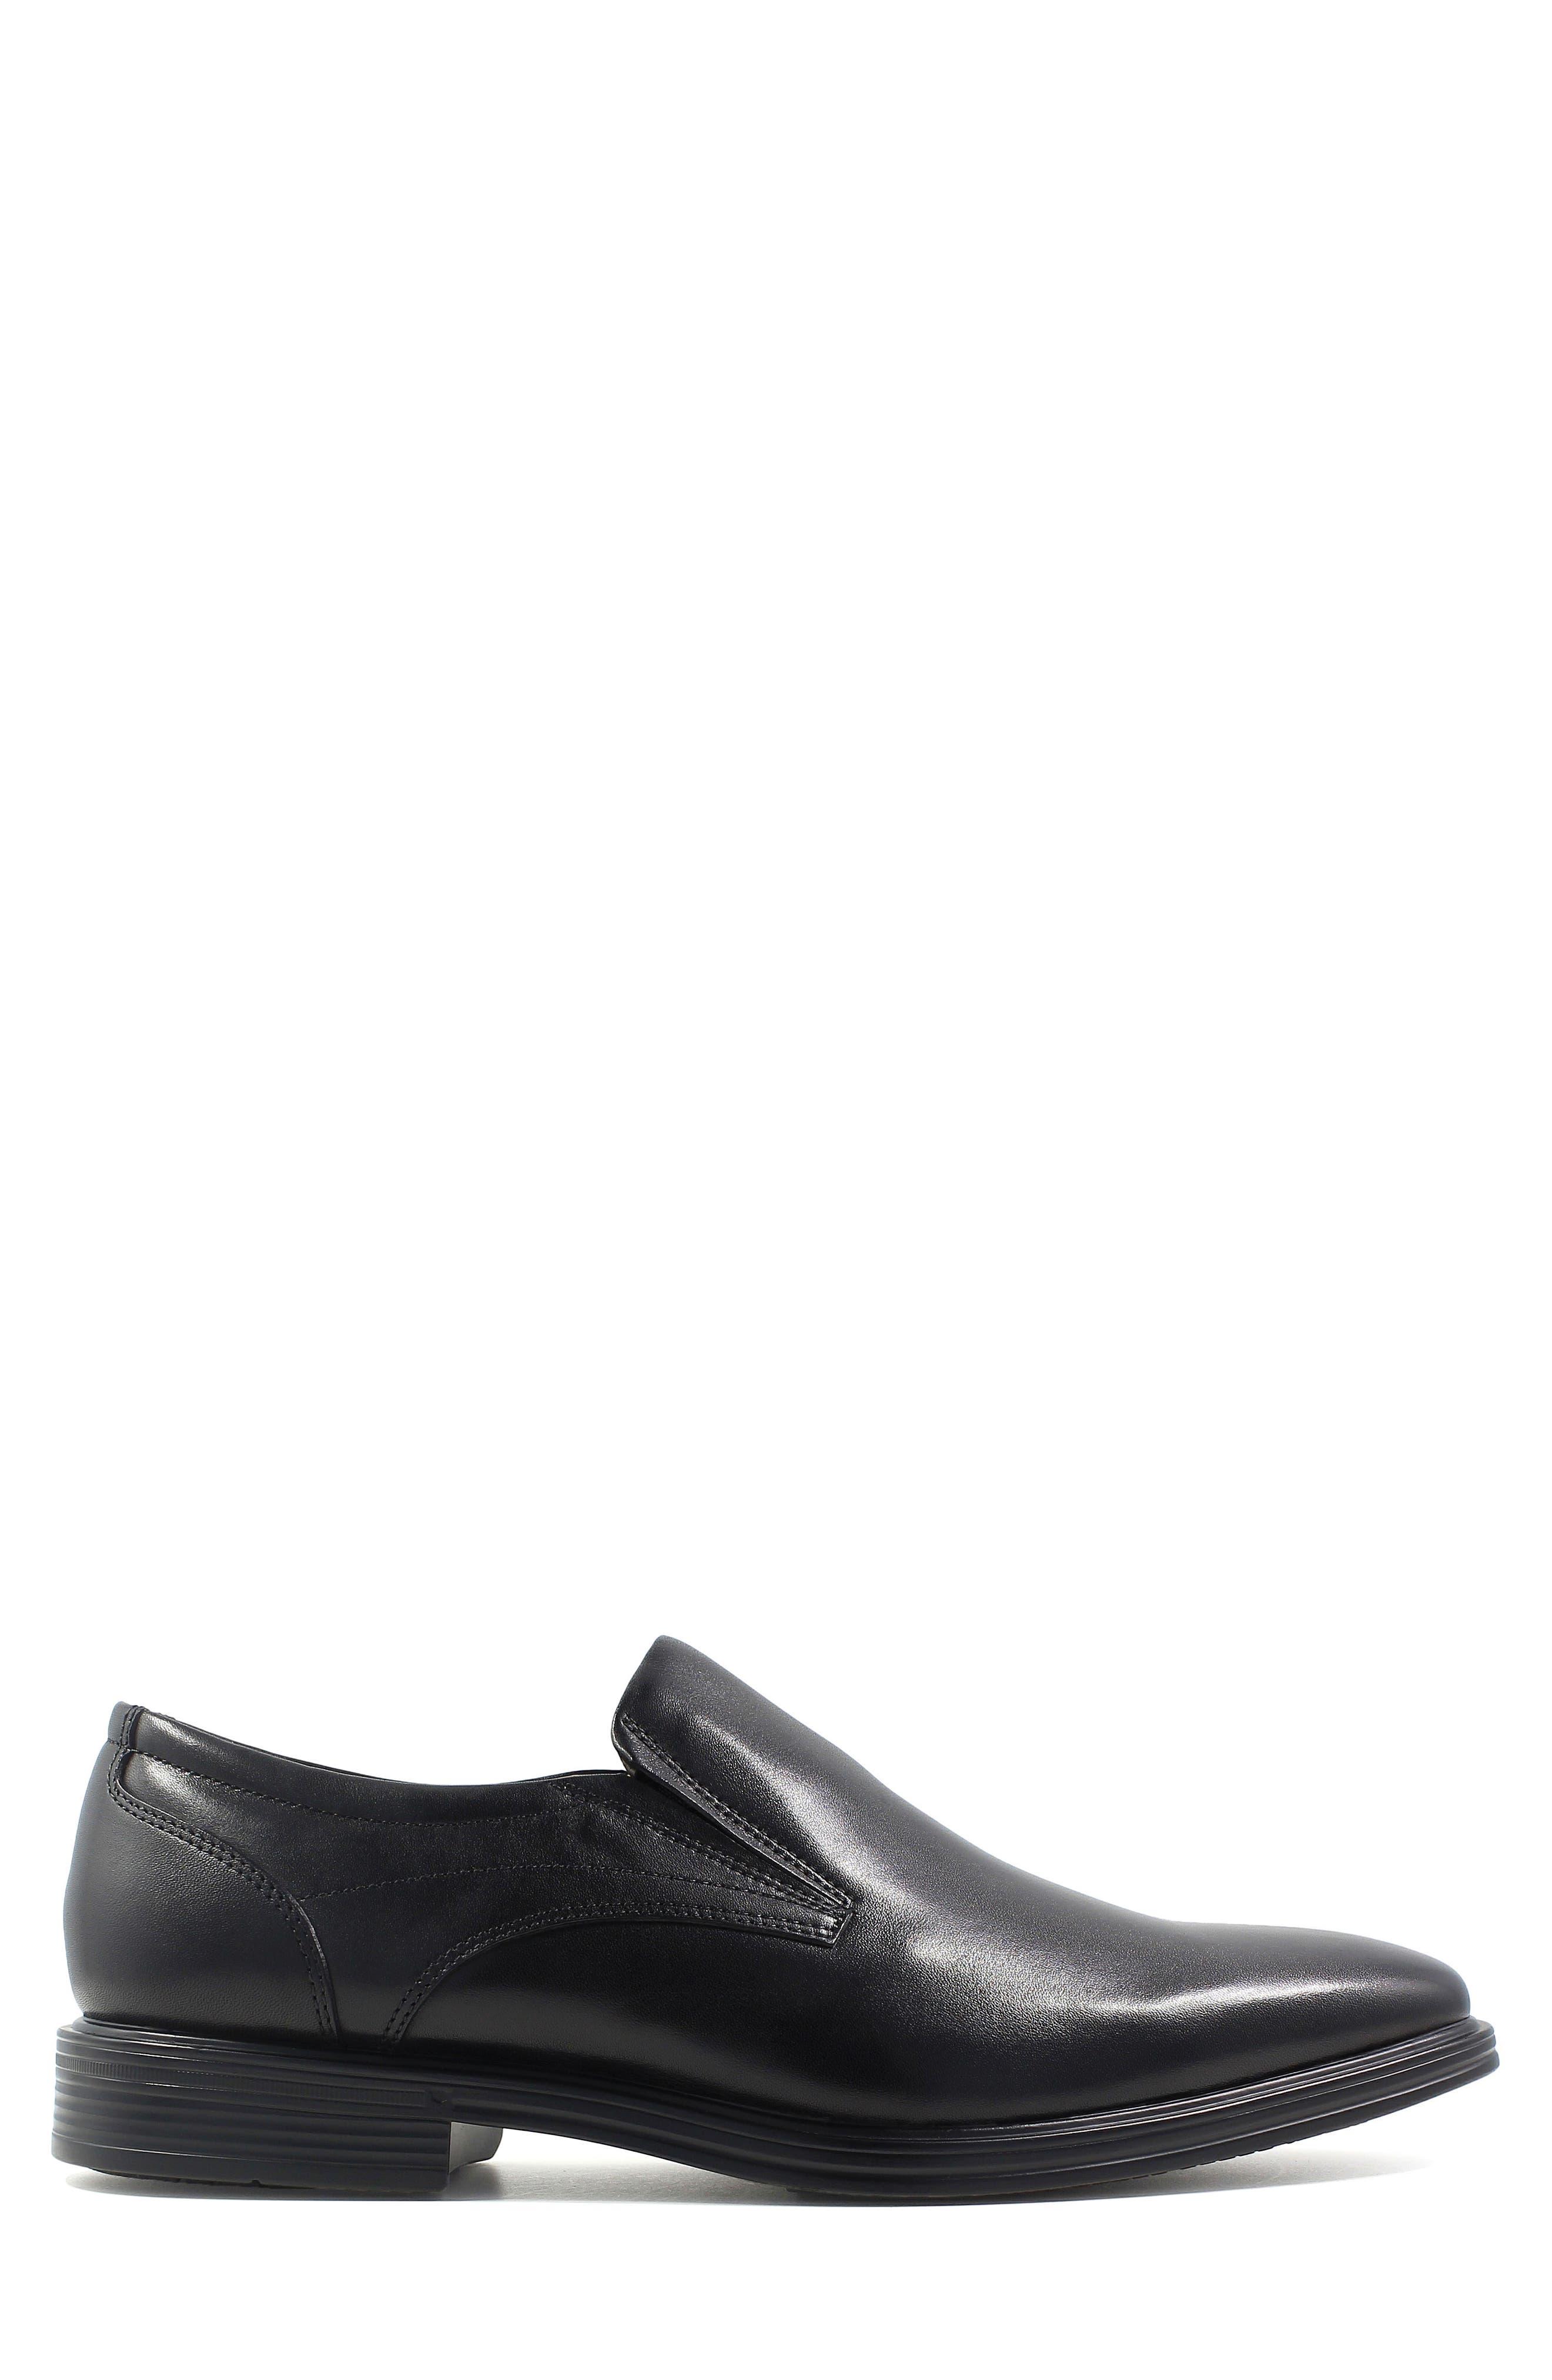 Heights Venetian Loafer,                             Alternate thumbnail 3, color,                             BLACK